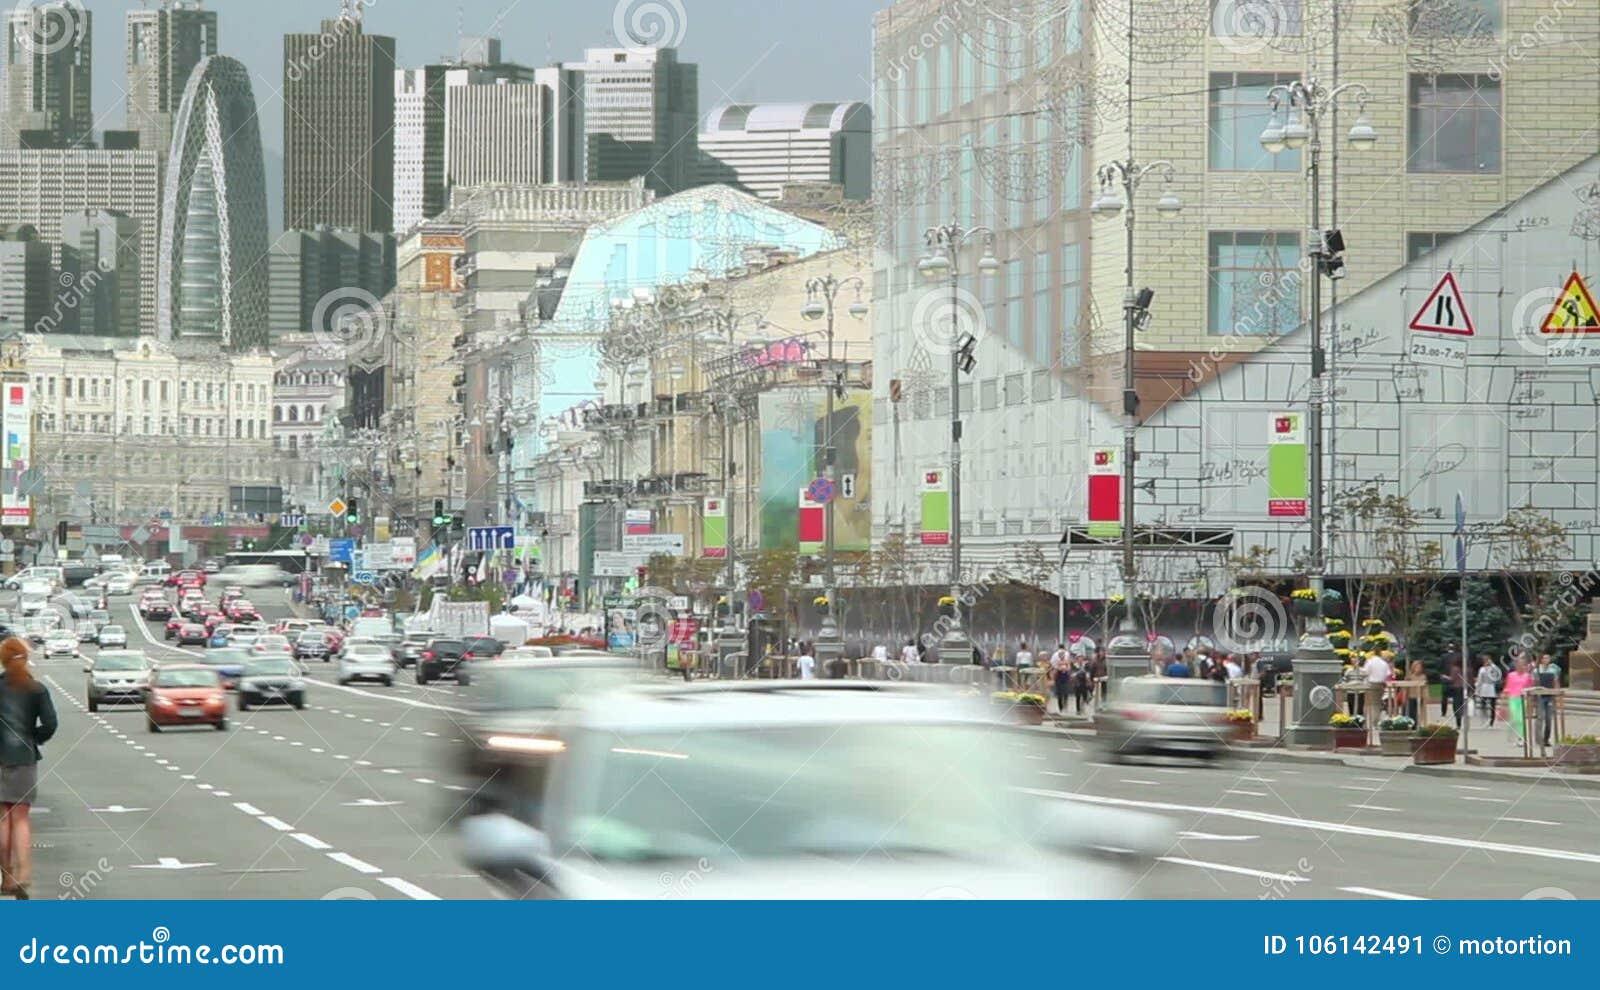 Drive Time Cars >> Megalopolis City Traffic Cars Drive Time Lapse Urban Skyline